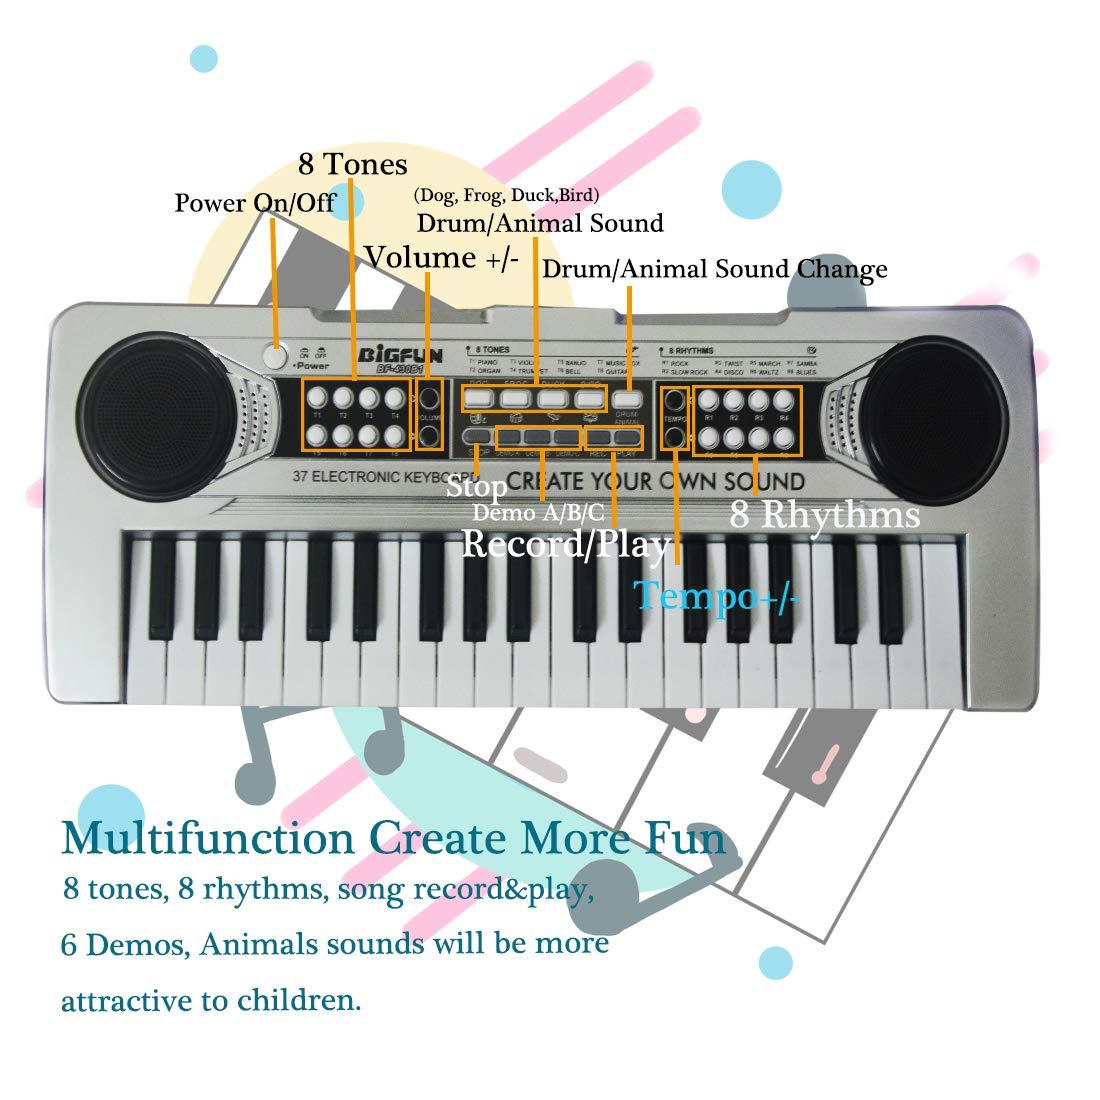 37 Keys Standard Size Multi-Function Electronic Organ Musical Kids Piano Teaching Keyboard for Kids Children Birthday FillADream Kids Piano